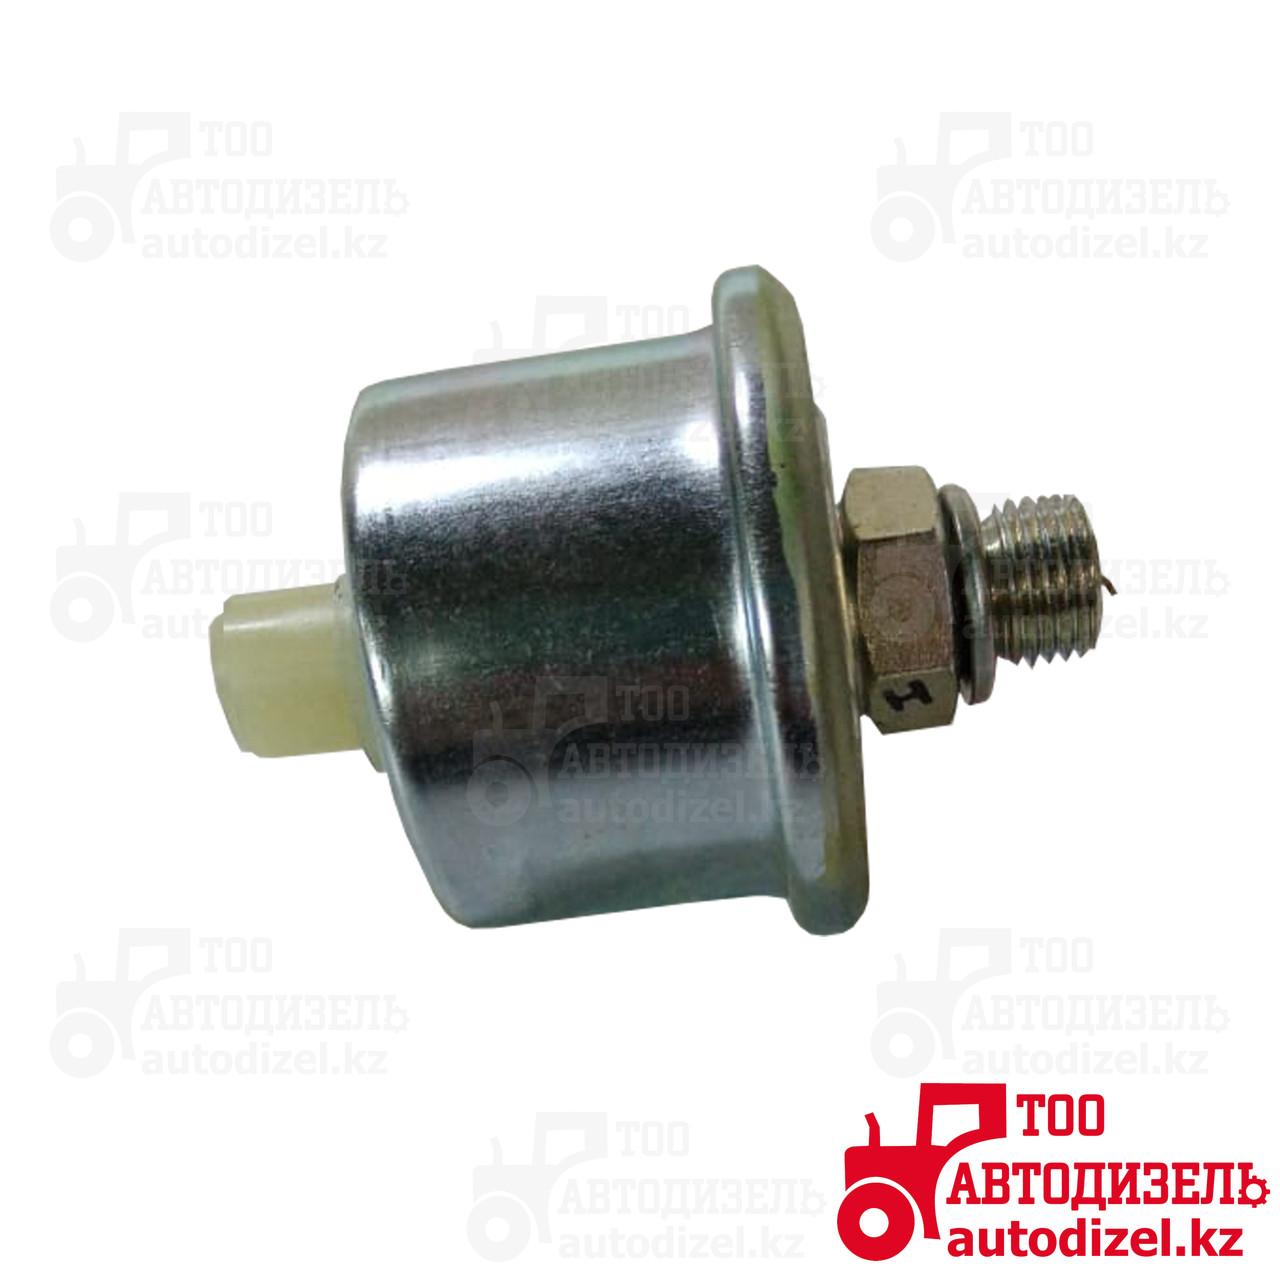 Датчик давления масла КАМАЗ,МАЗ-370